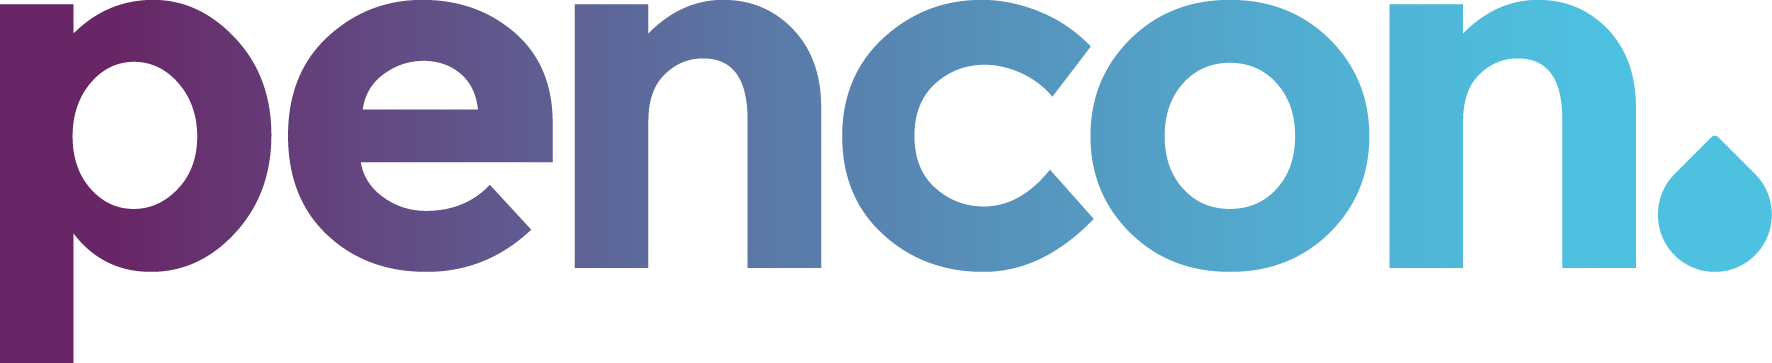 Pencon_logo_tone_RGB[2]